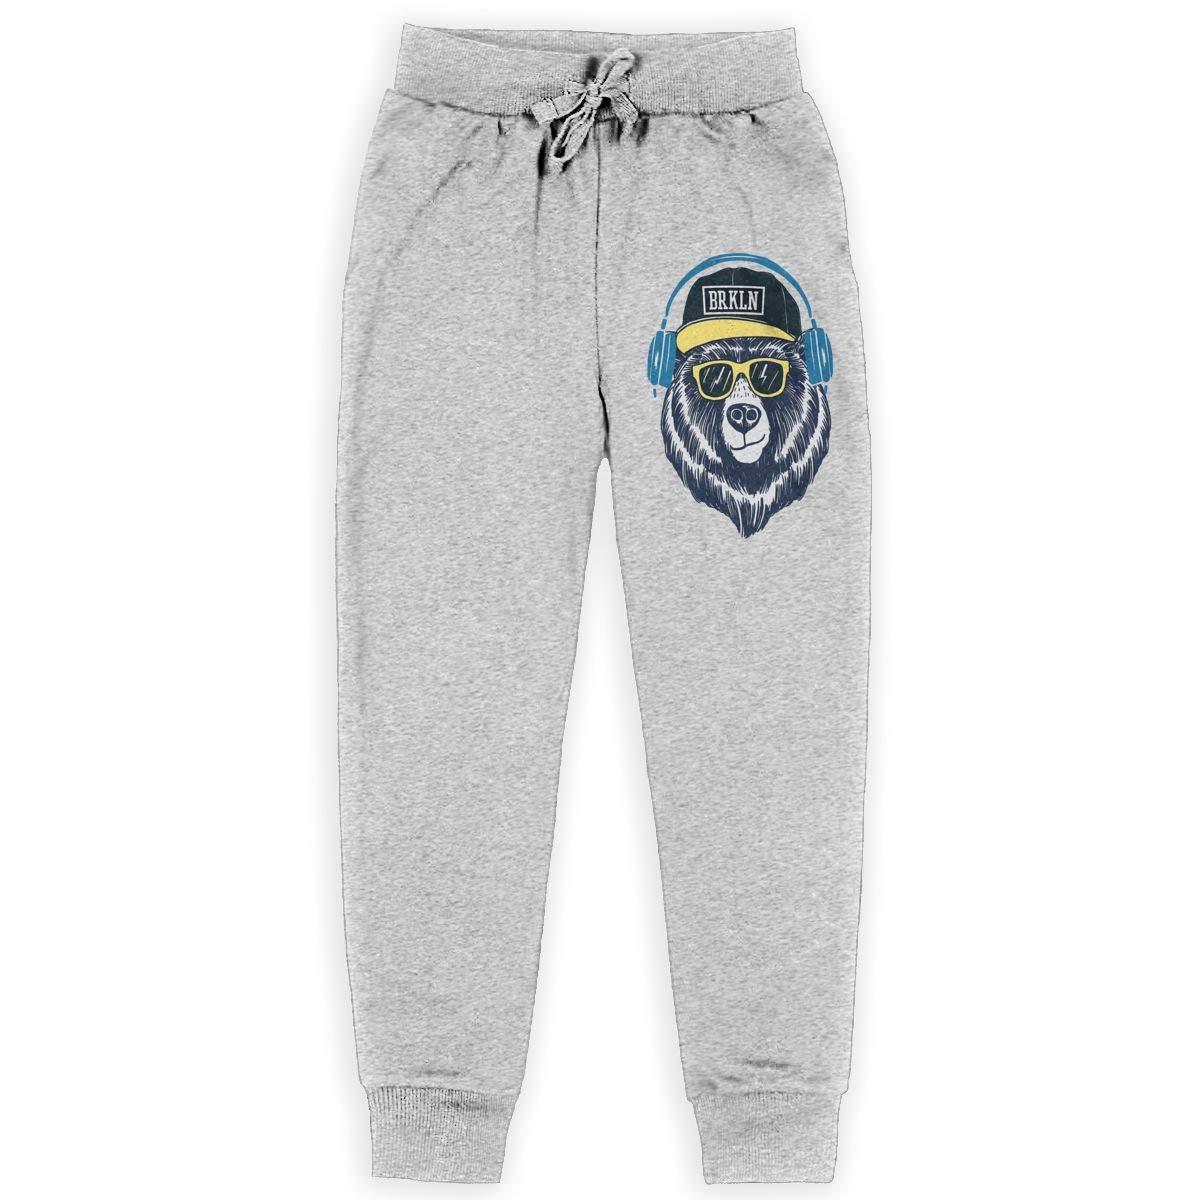 Xinding Boys Casual Jogger Sweatpants Cool Bear Adjustable Waist Pants with Pocket